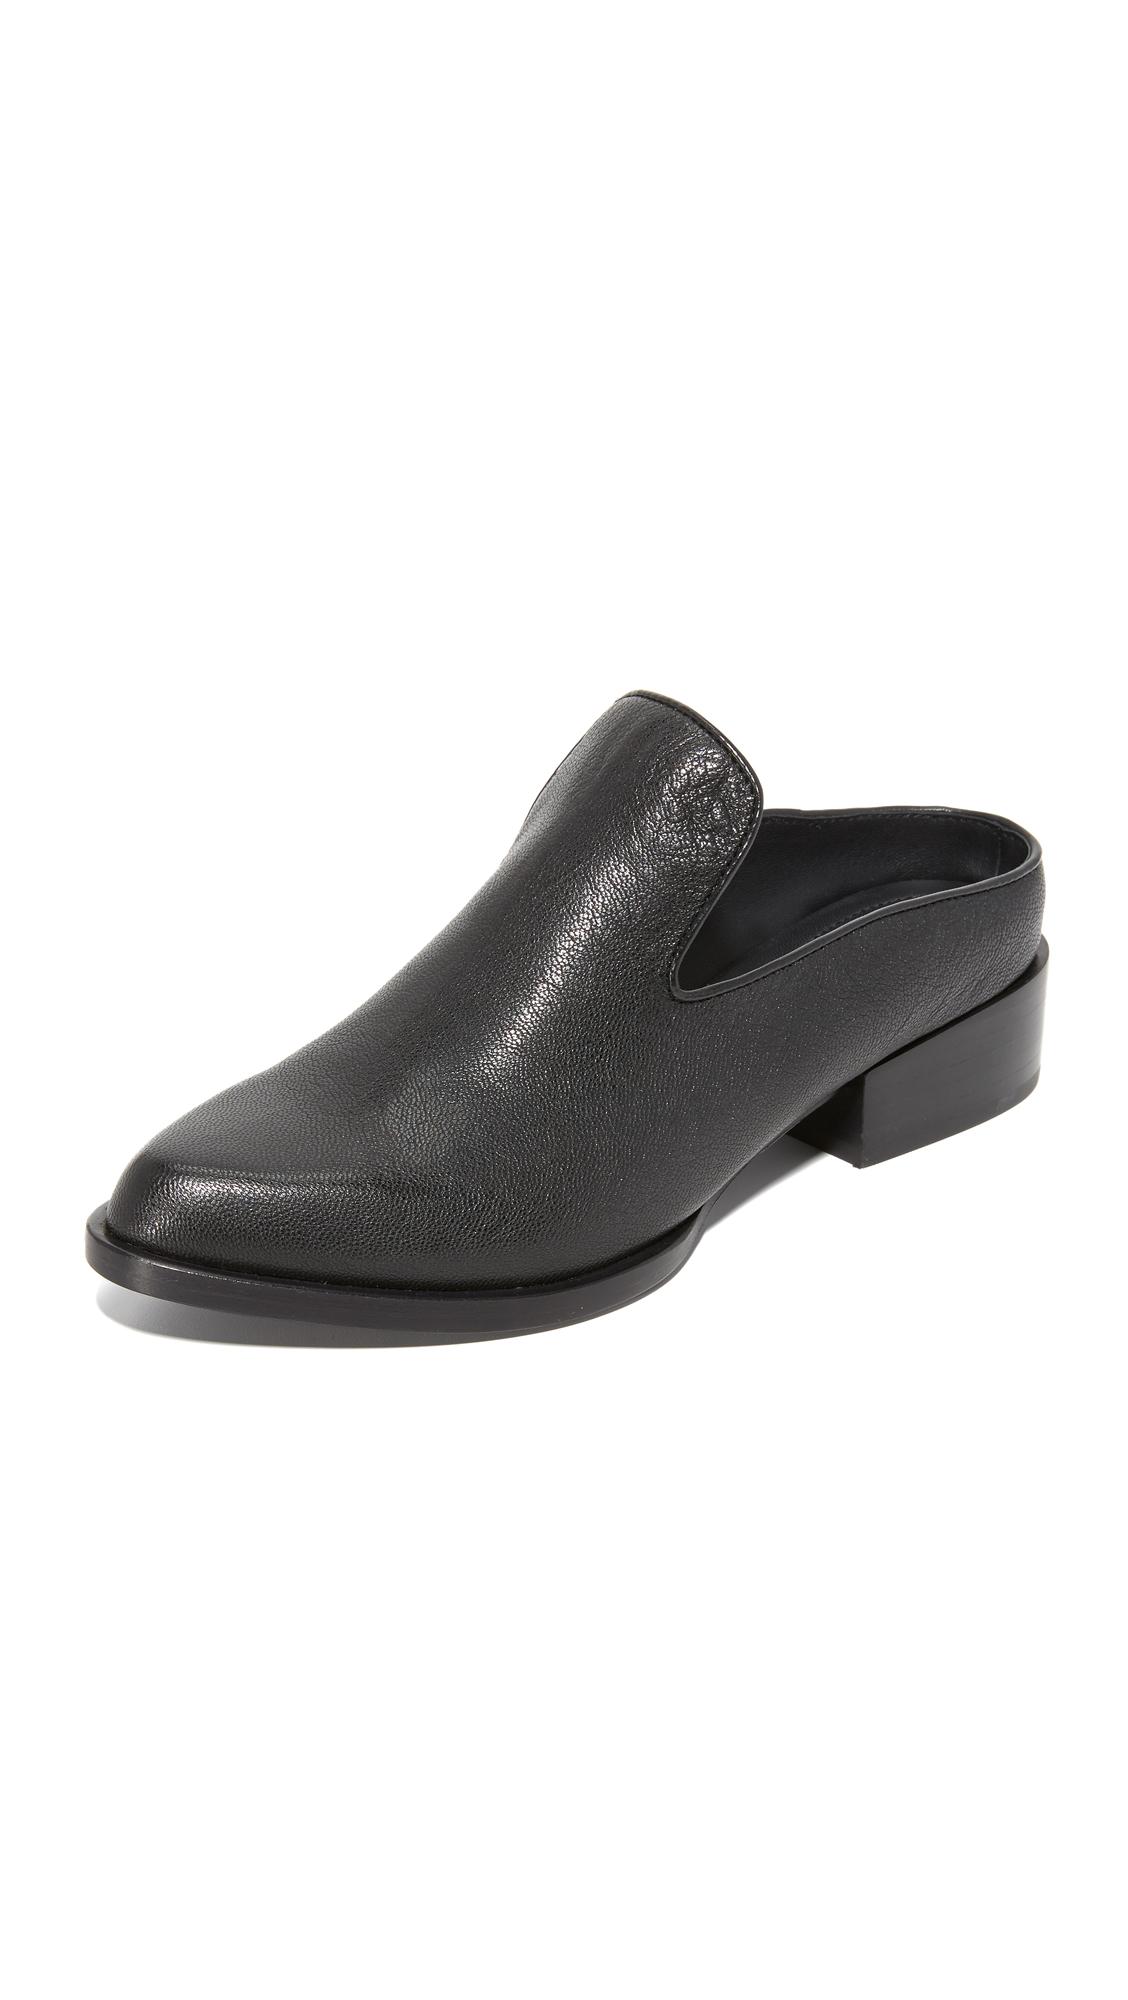 Dkny Lark Mules - Black at Shopbop